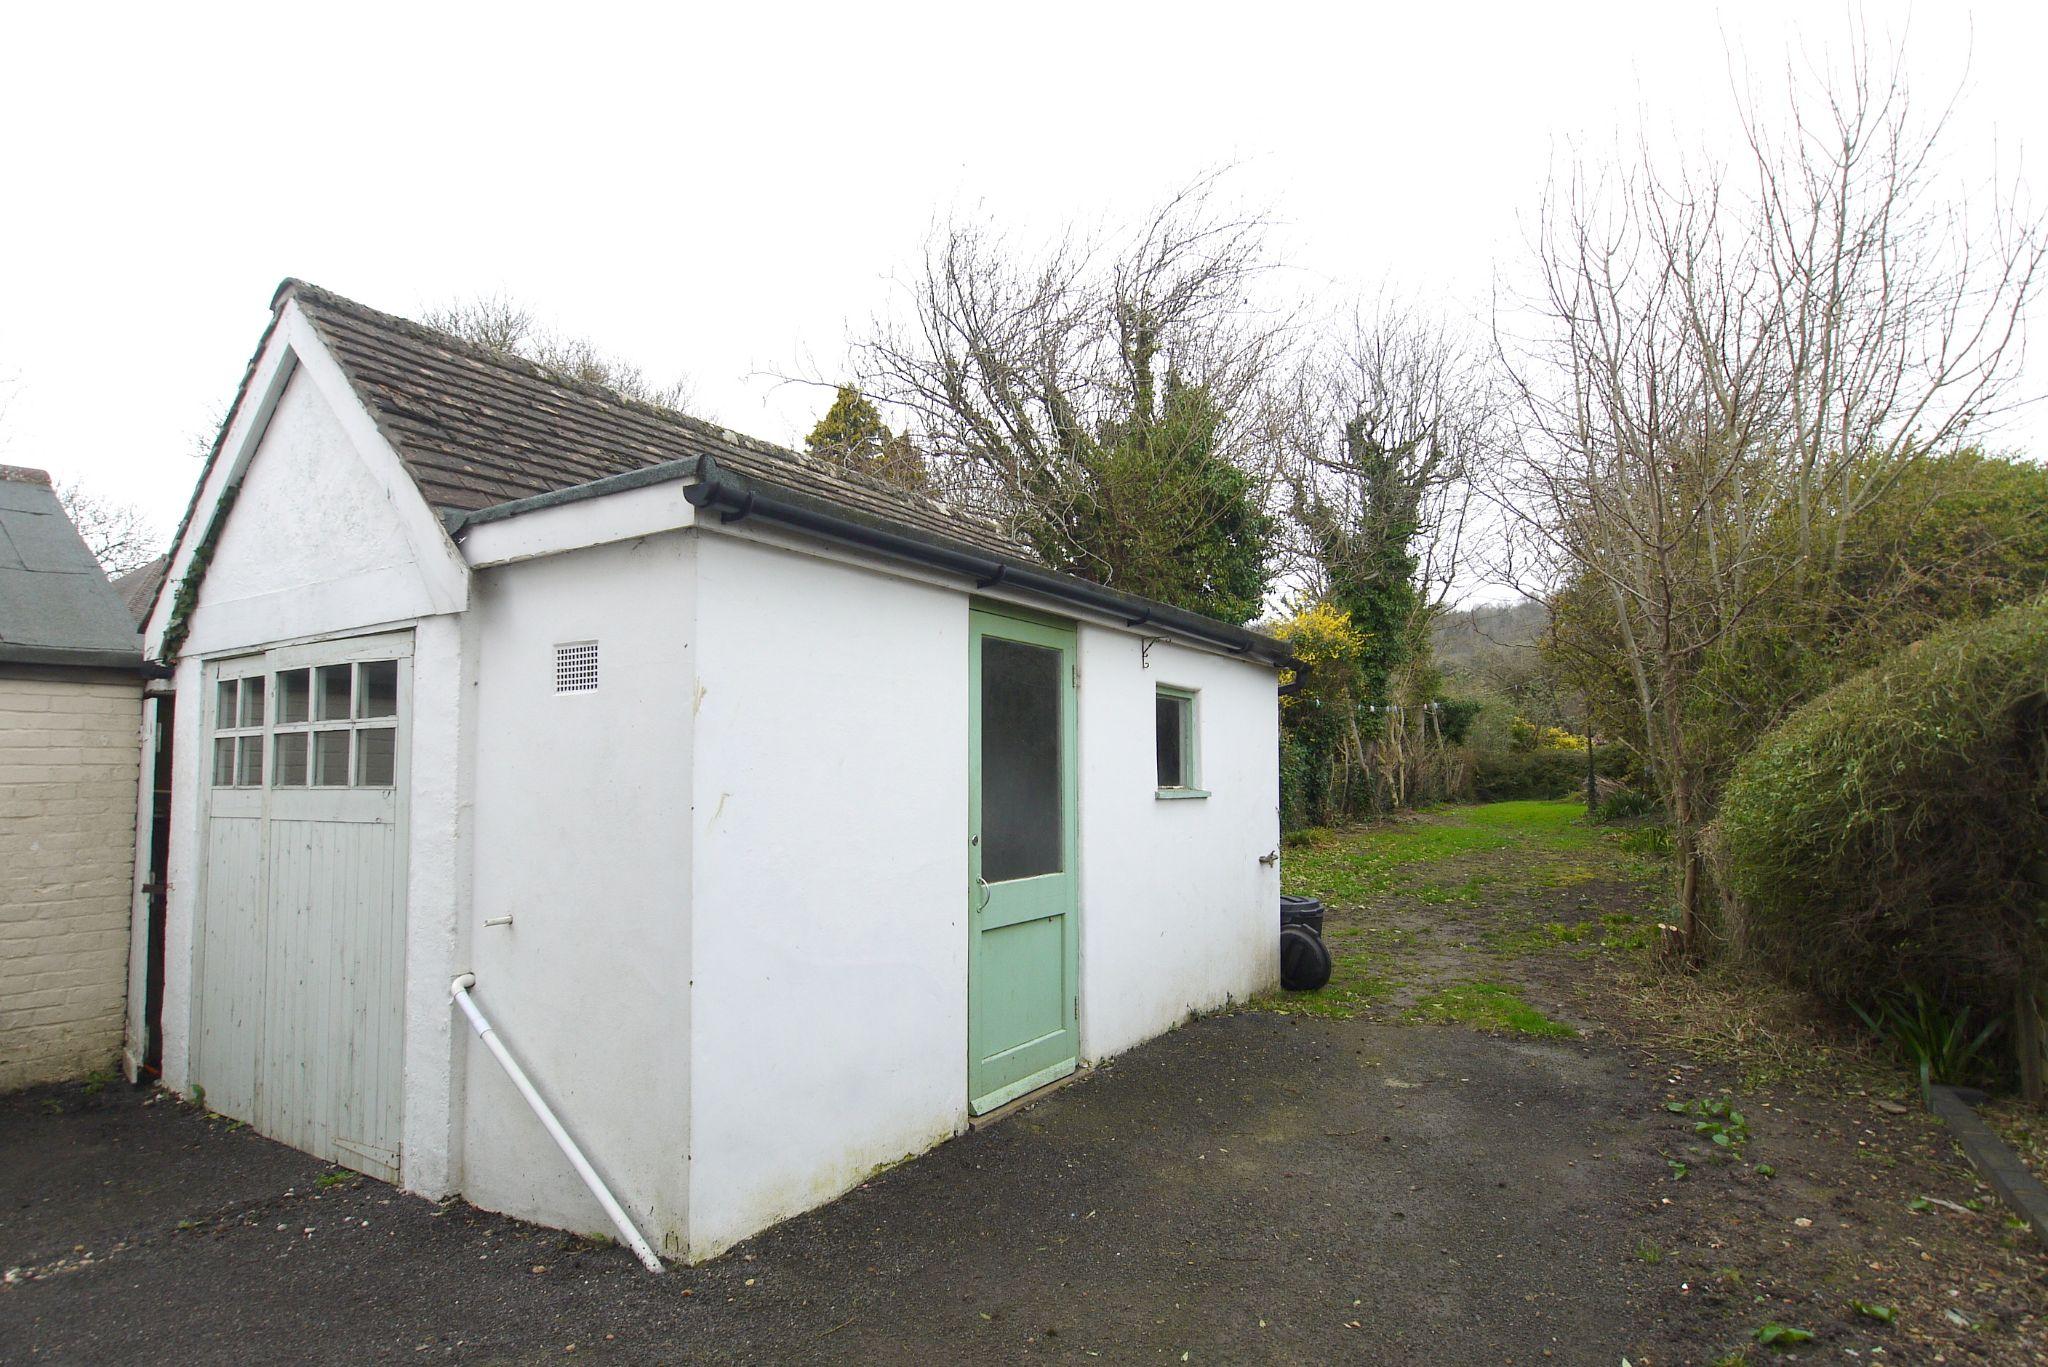 3 bedroom semi-detached house Sold in Sevenoaks - Photograph 12